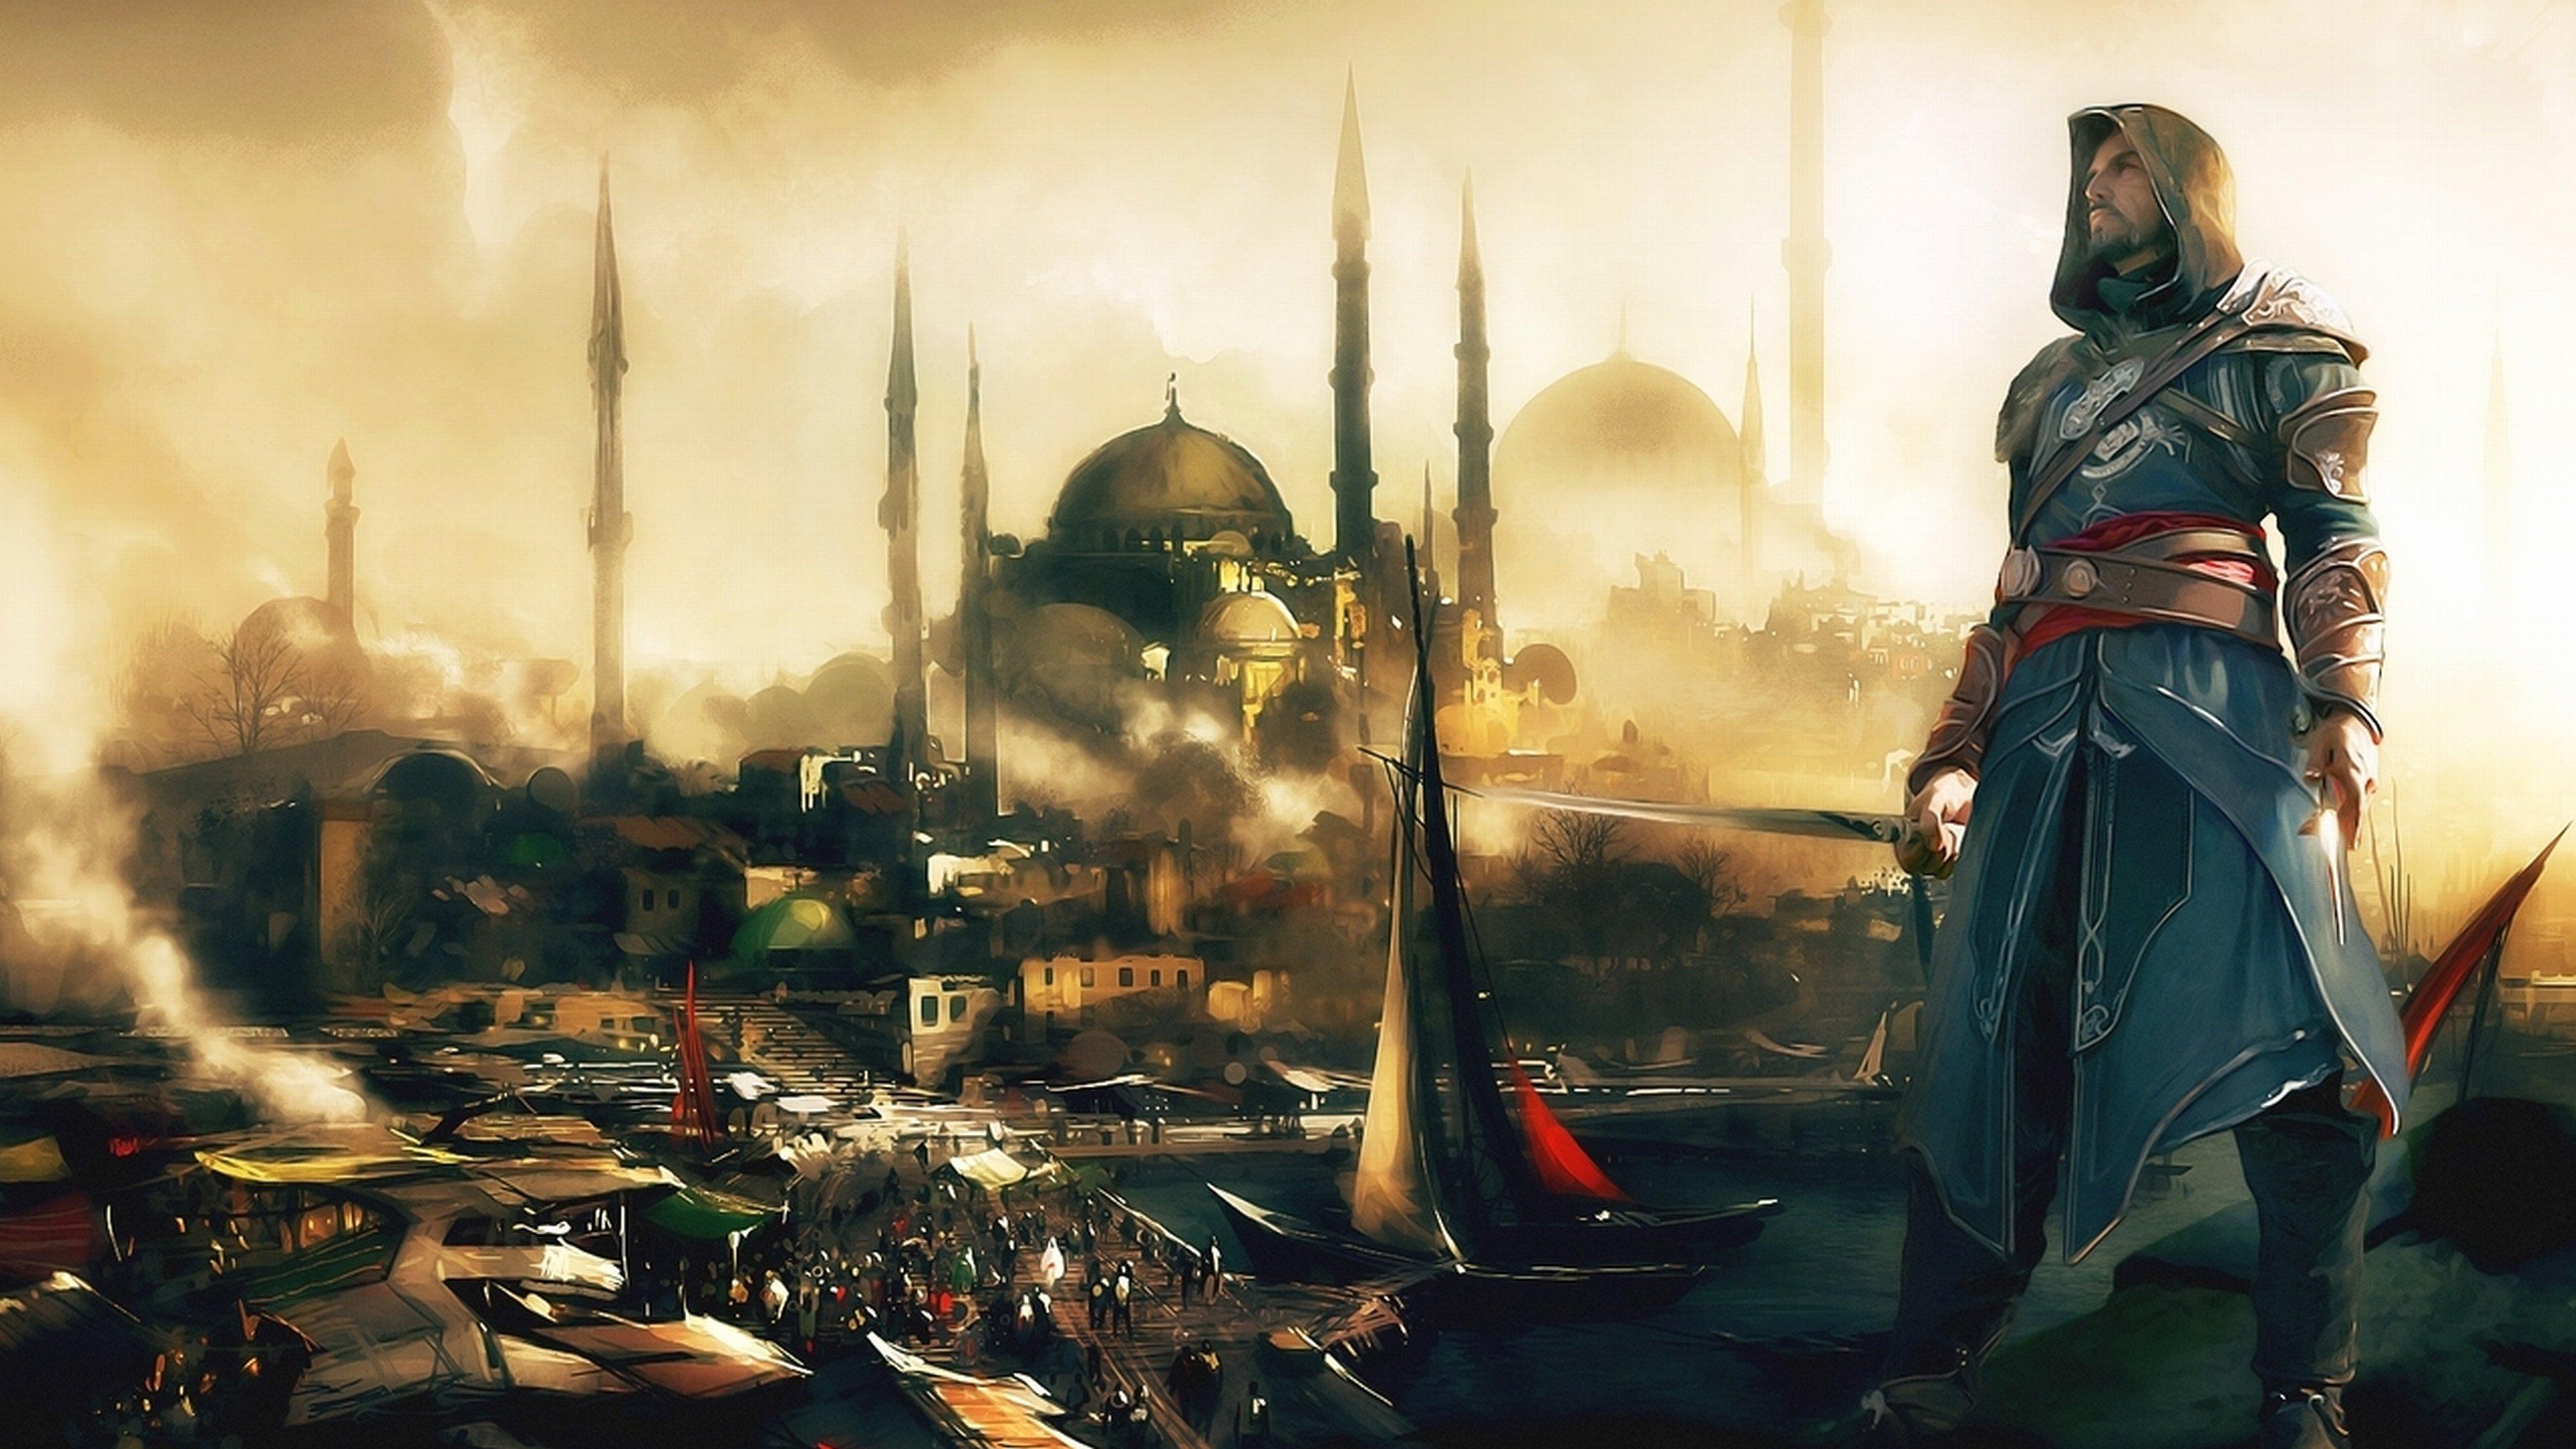 Assassins Creed Revelations Wallpapers 3840x2160 Ultra Hd 4k